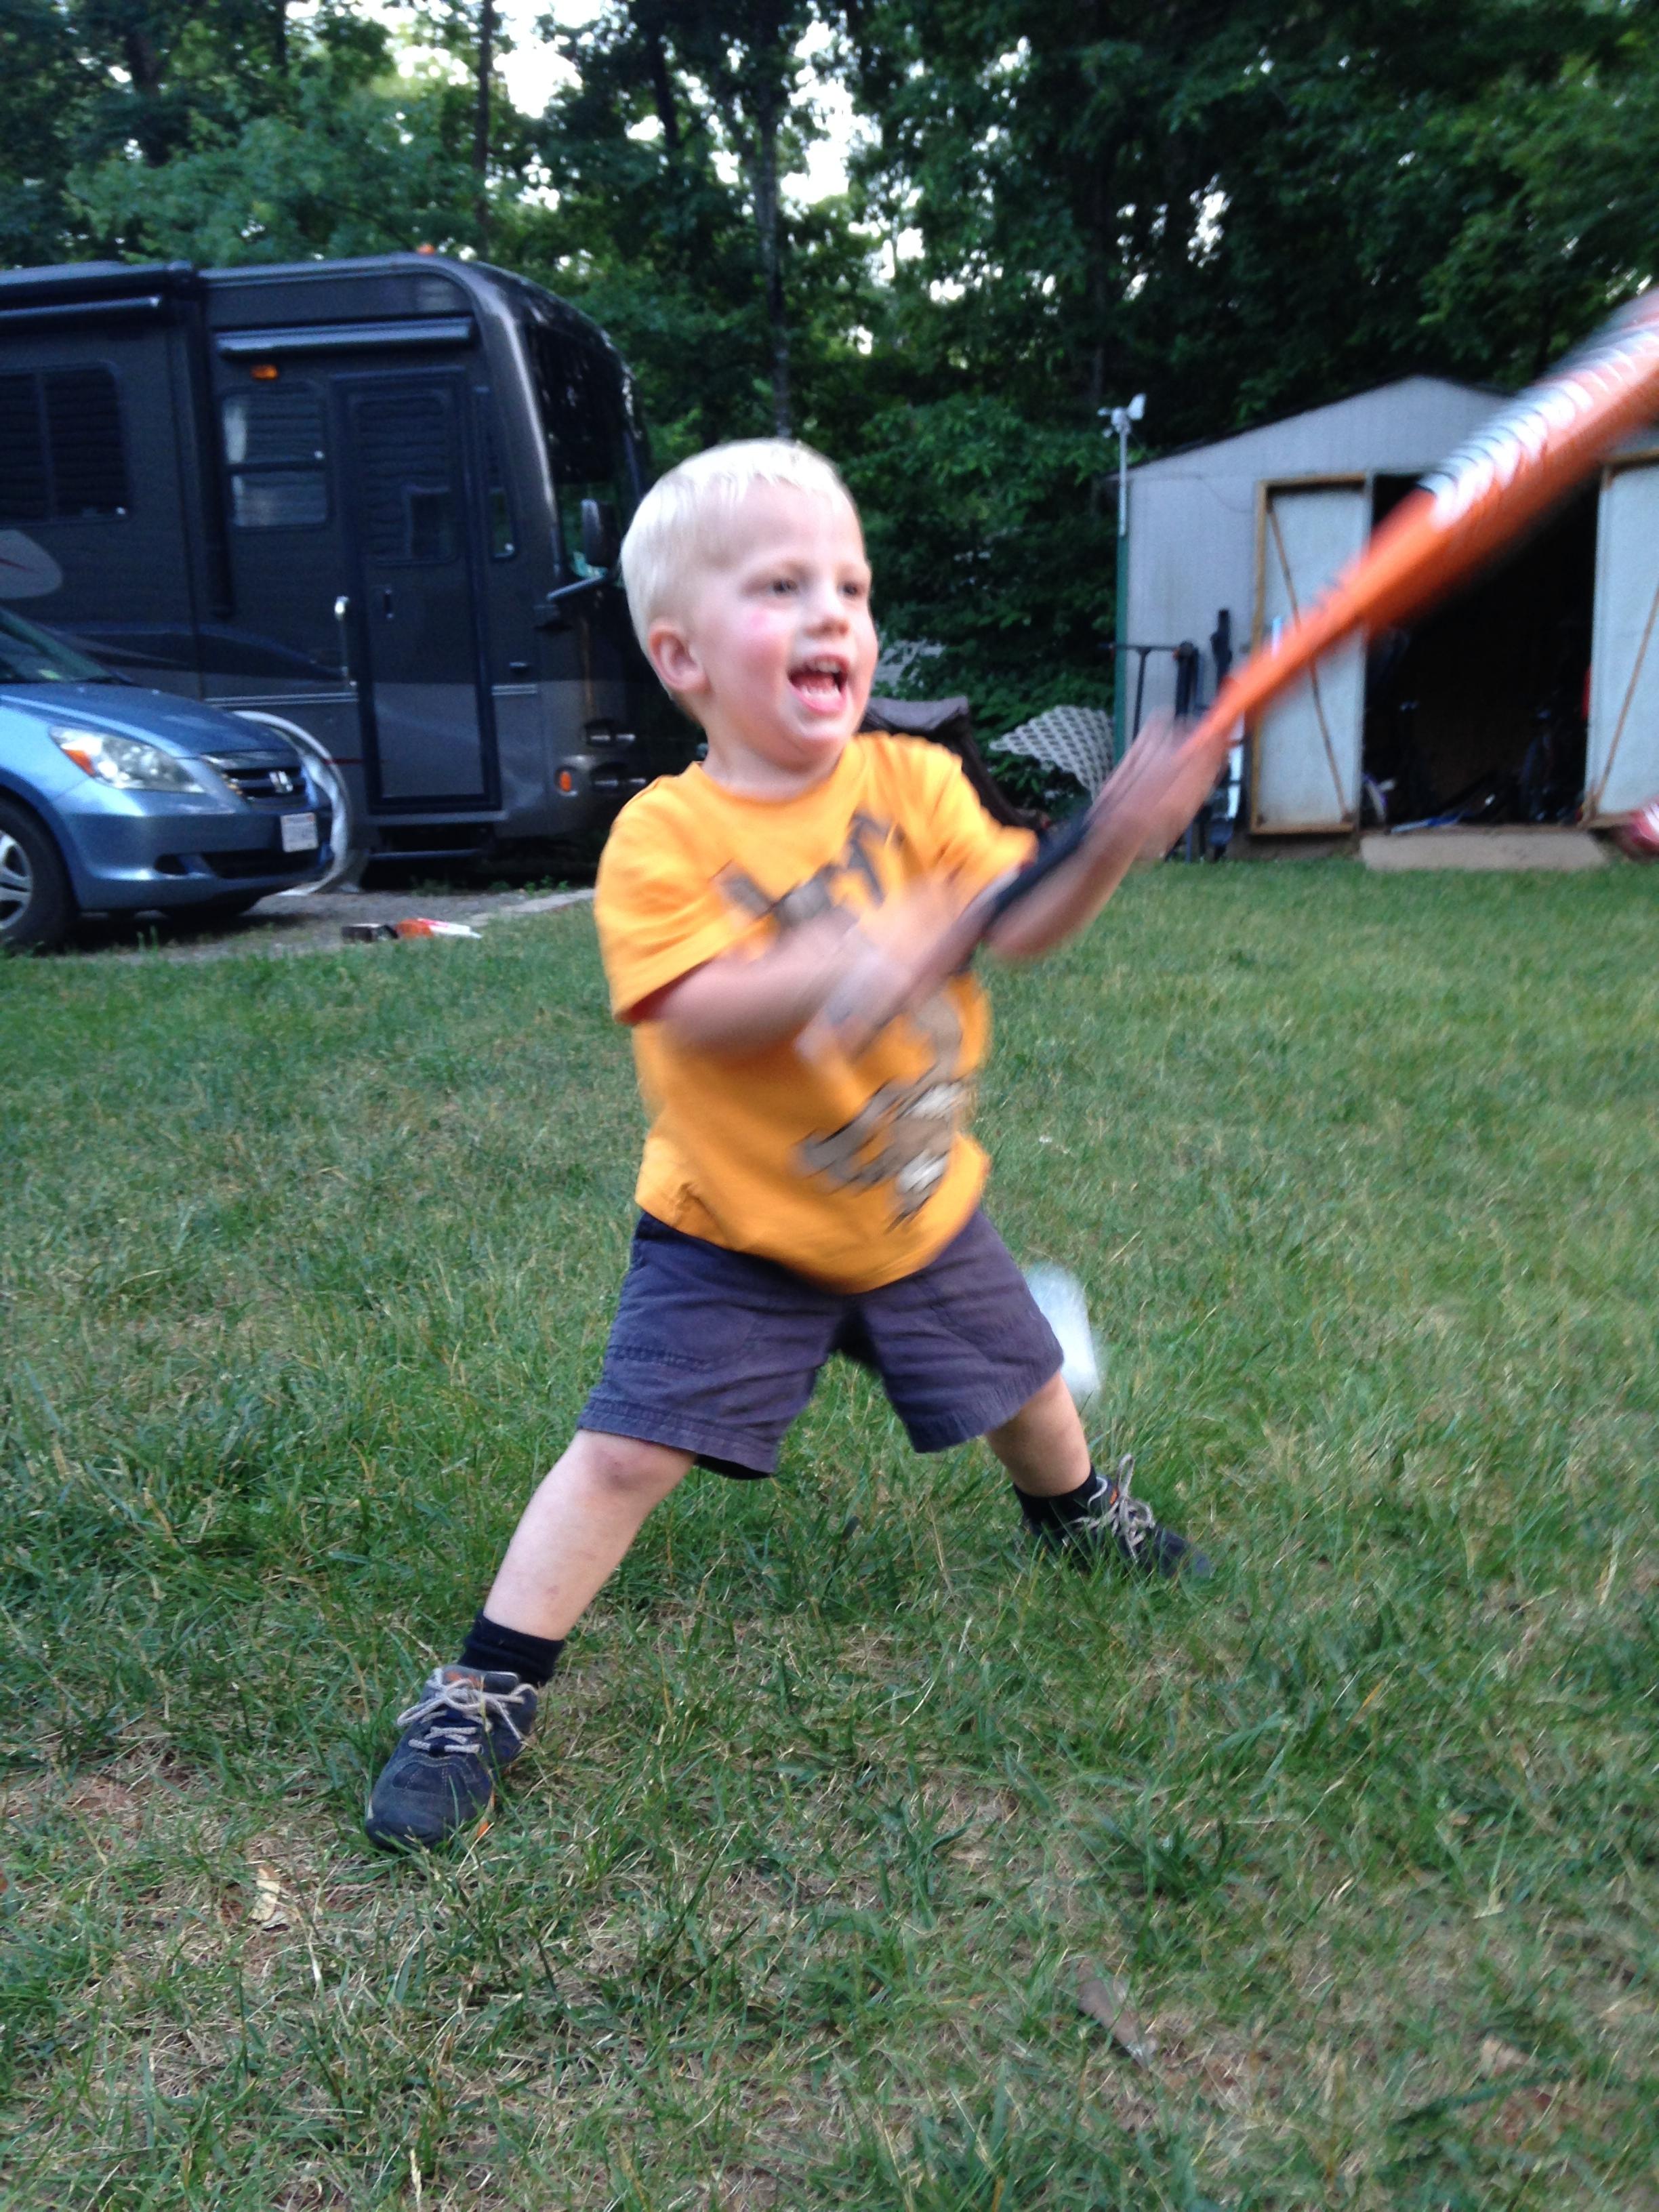 Kolby learning to play baseball.